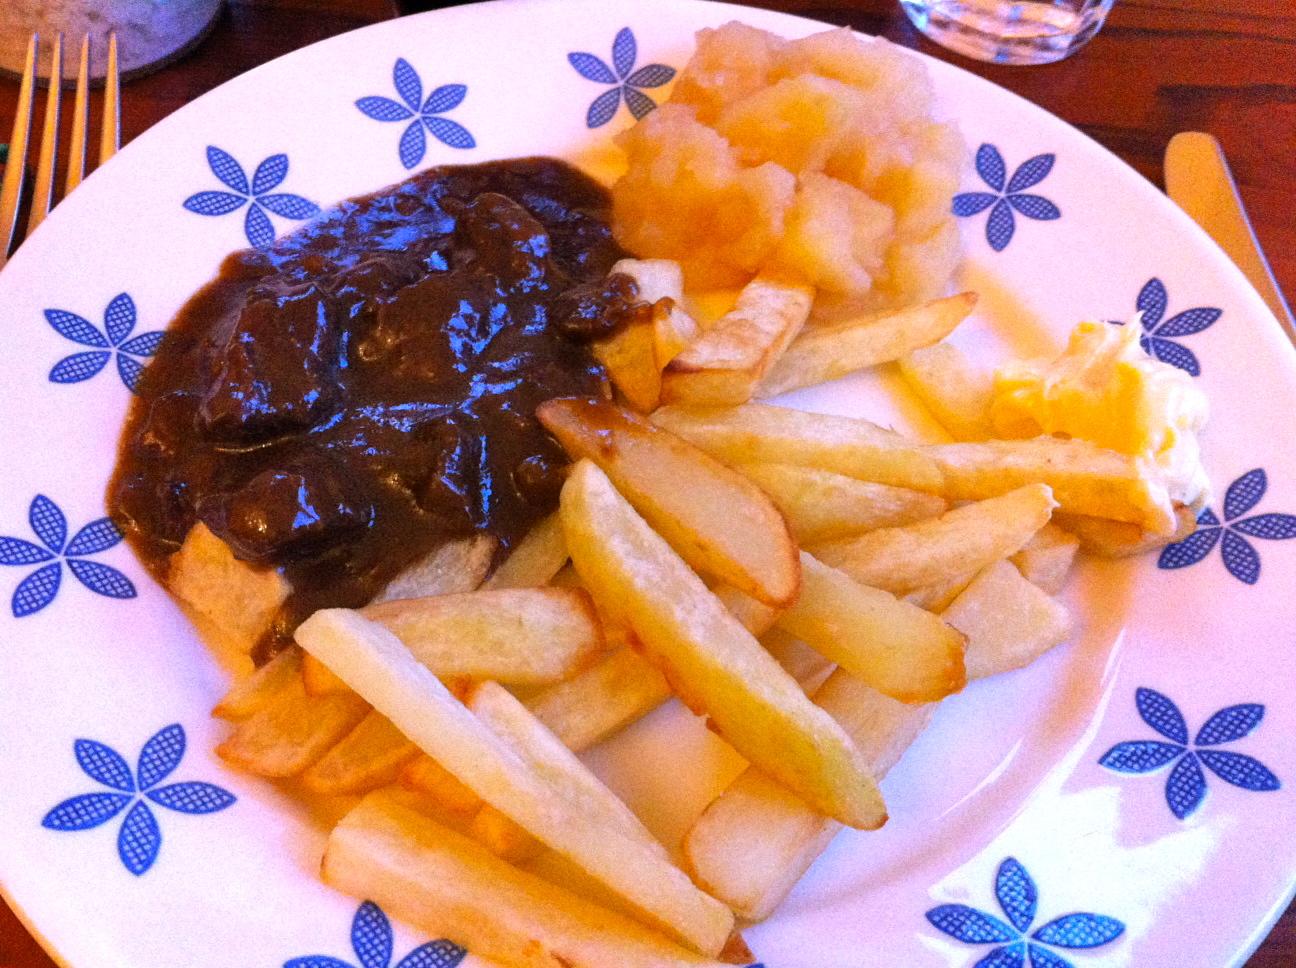 bord patat met paard close